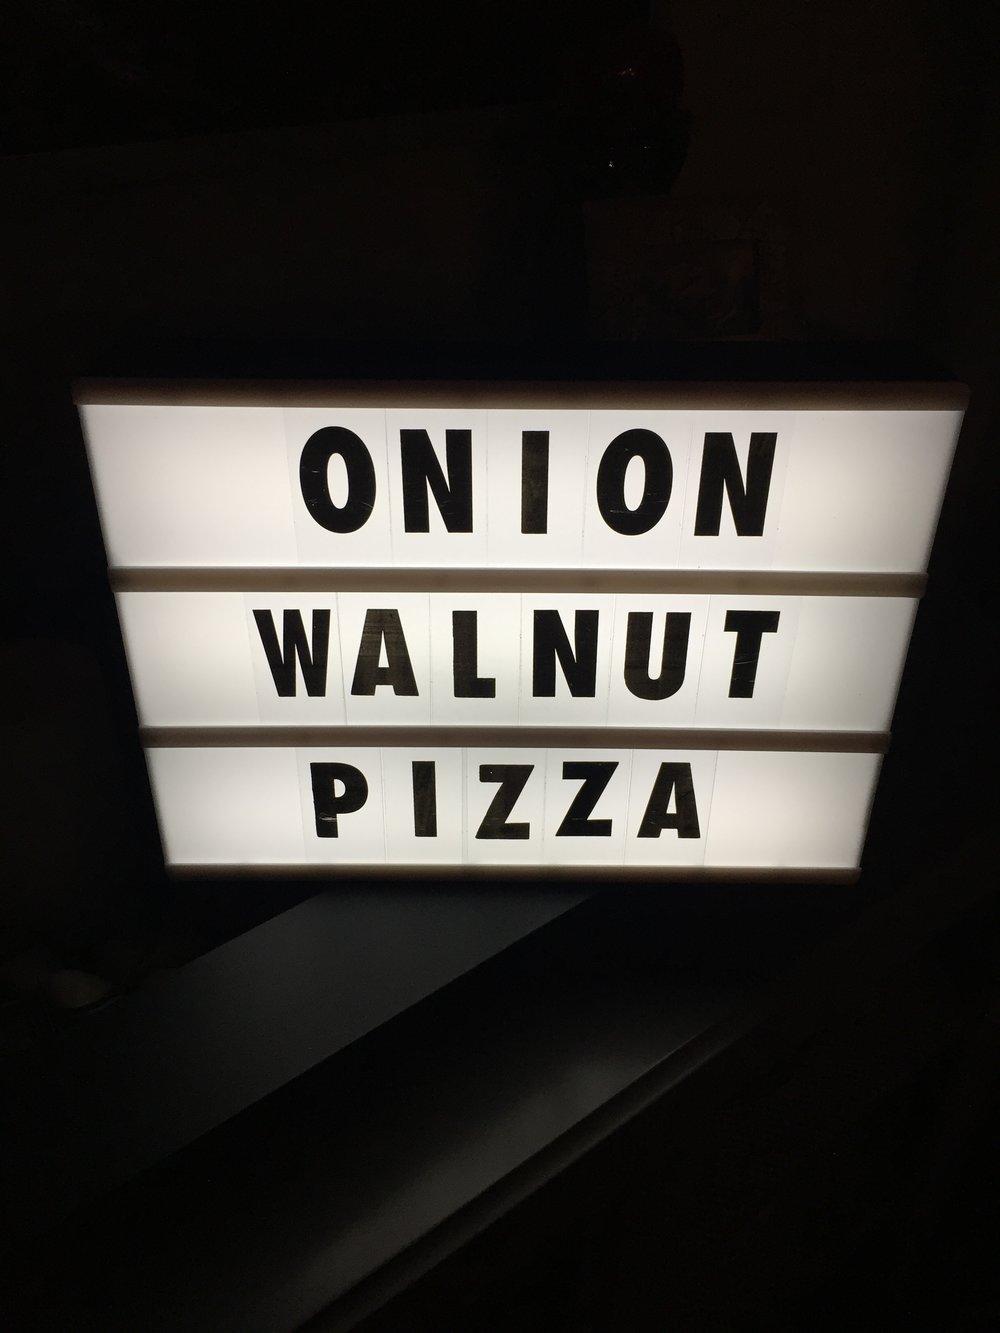 75OnionWalnutPizza1.JPG